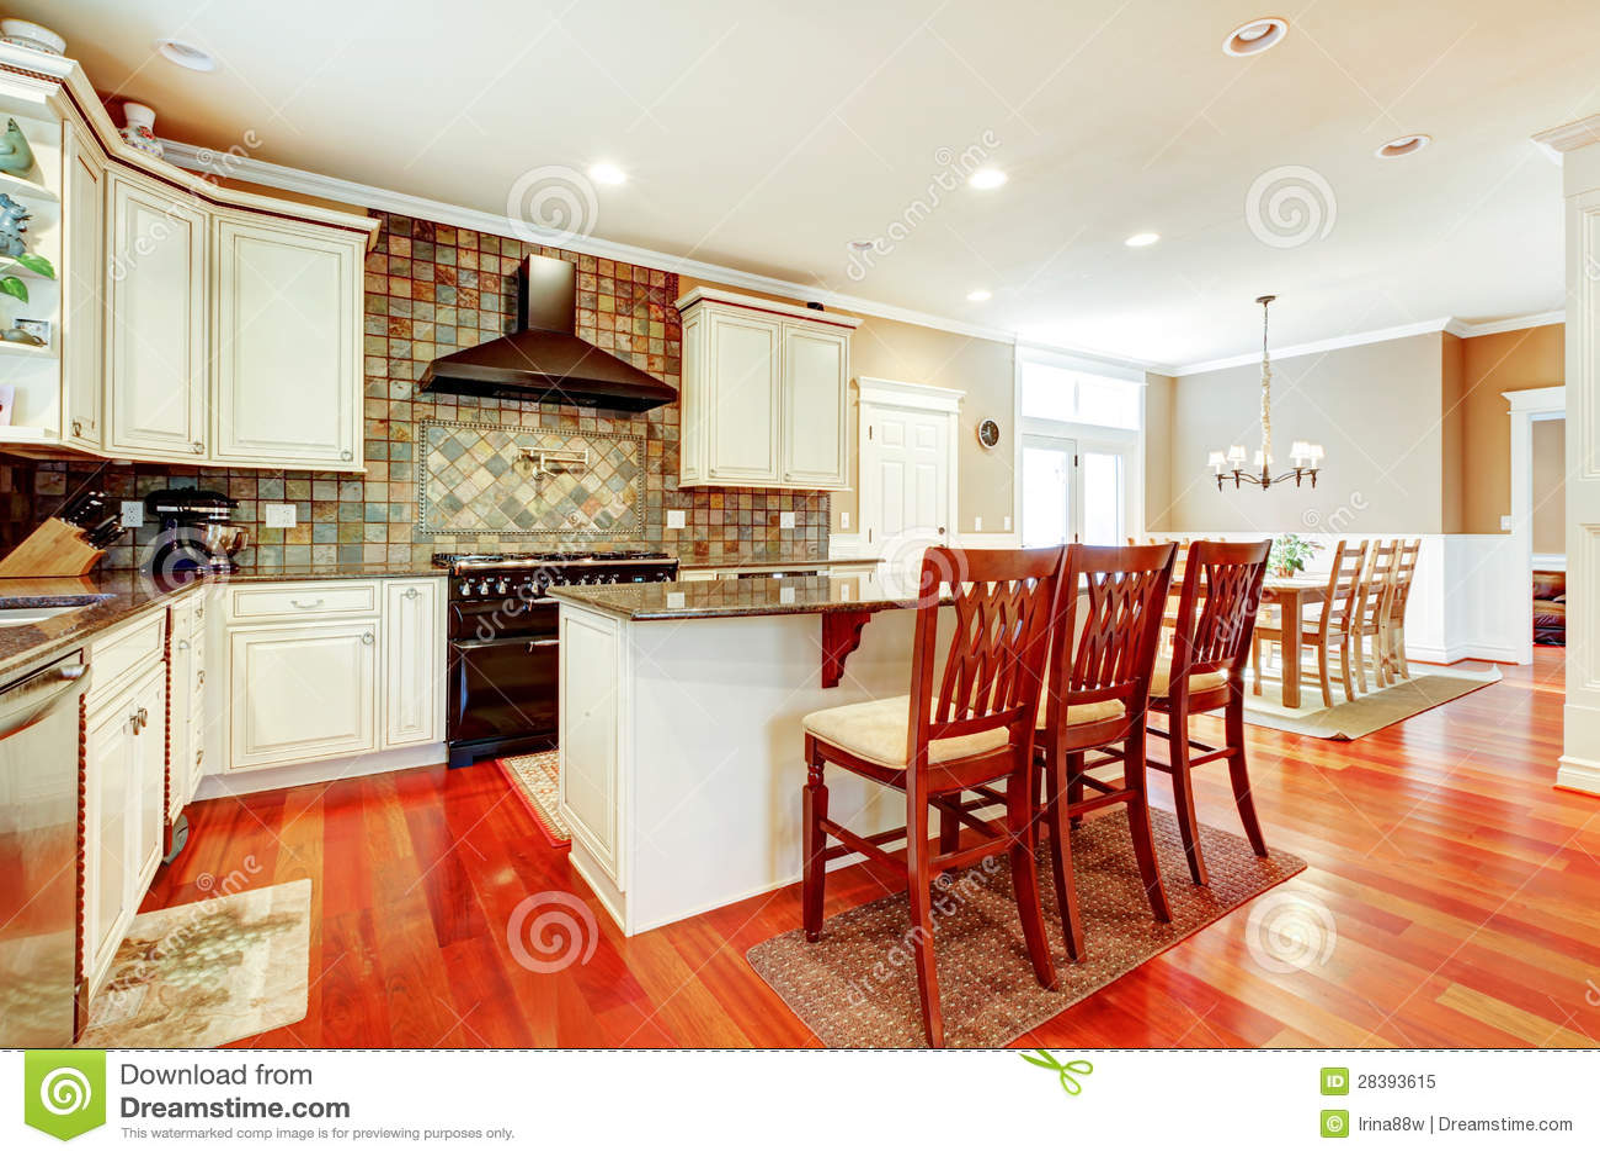 astonishing luxury kitchen island chairs | Luxury White Kitchen With Cherry Hardwood And Island With ...